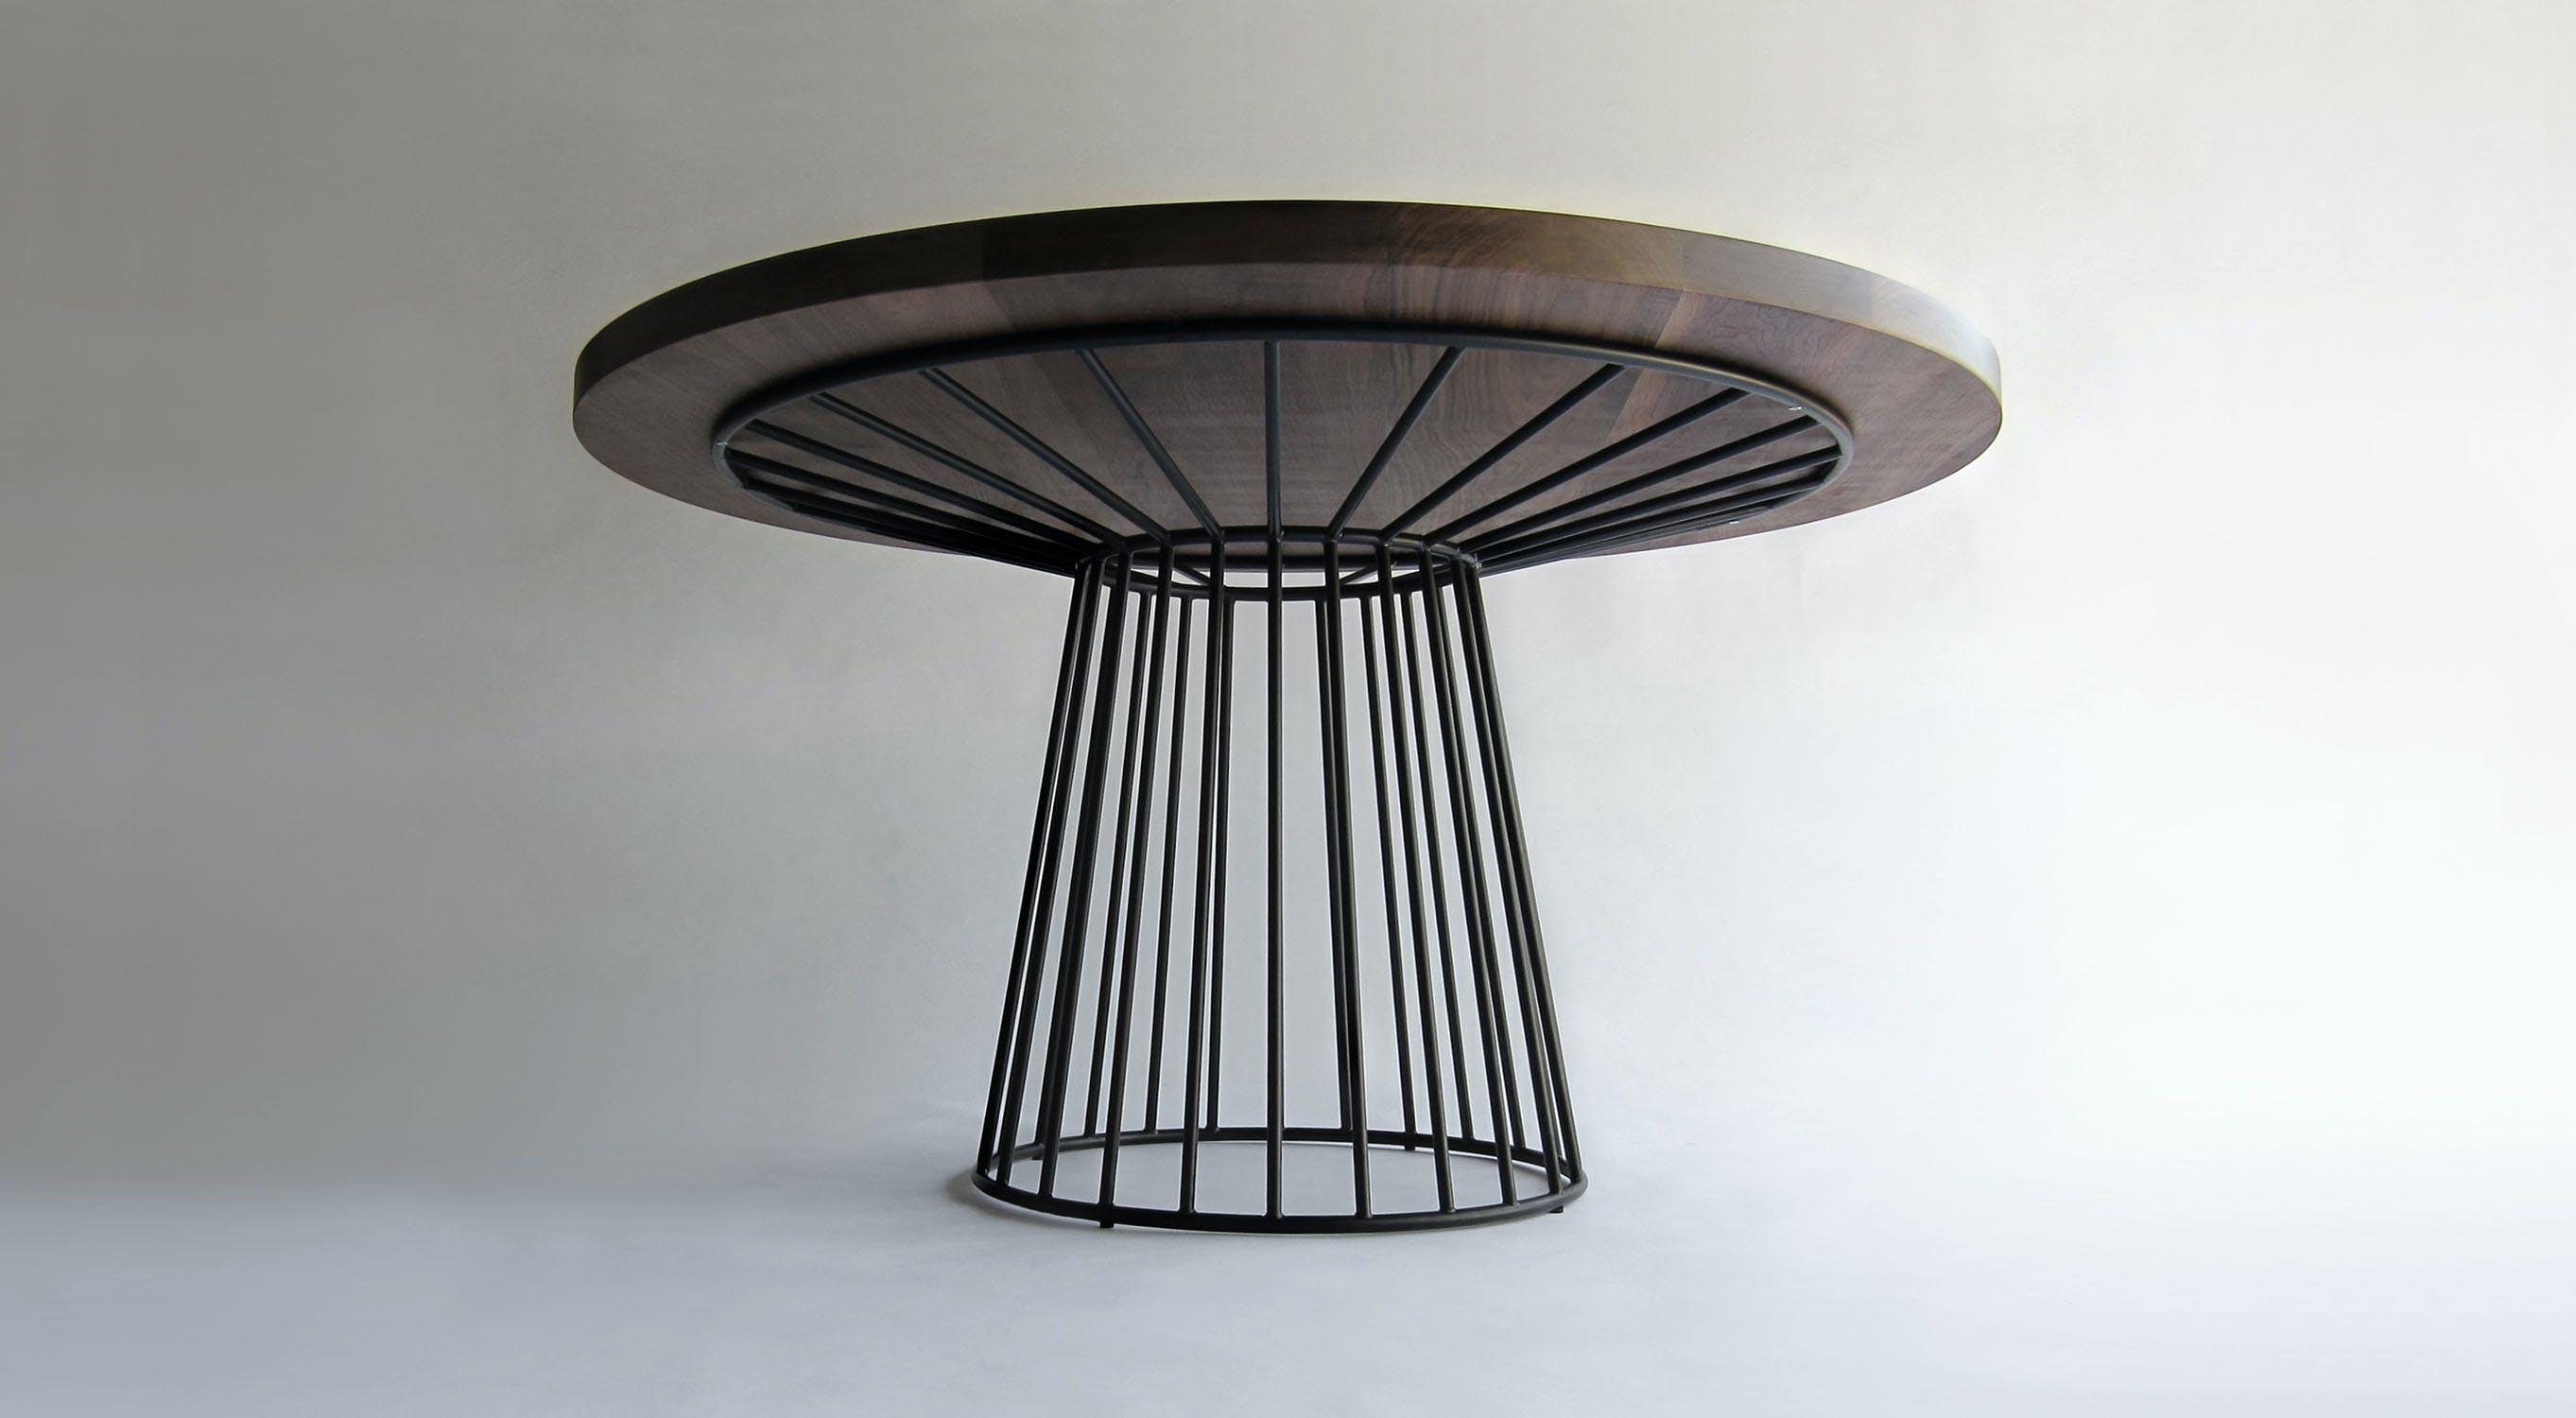 Wired Dining Table Walnut W Flat Black